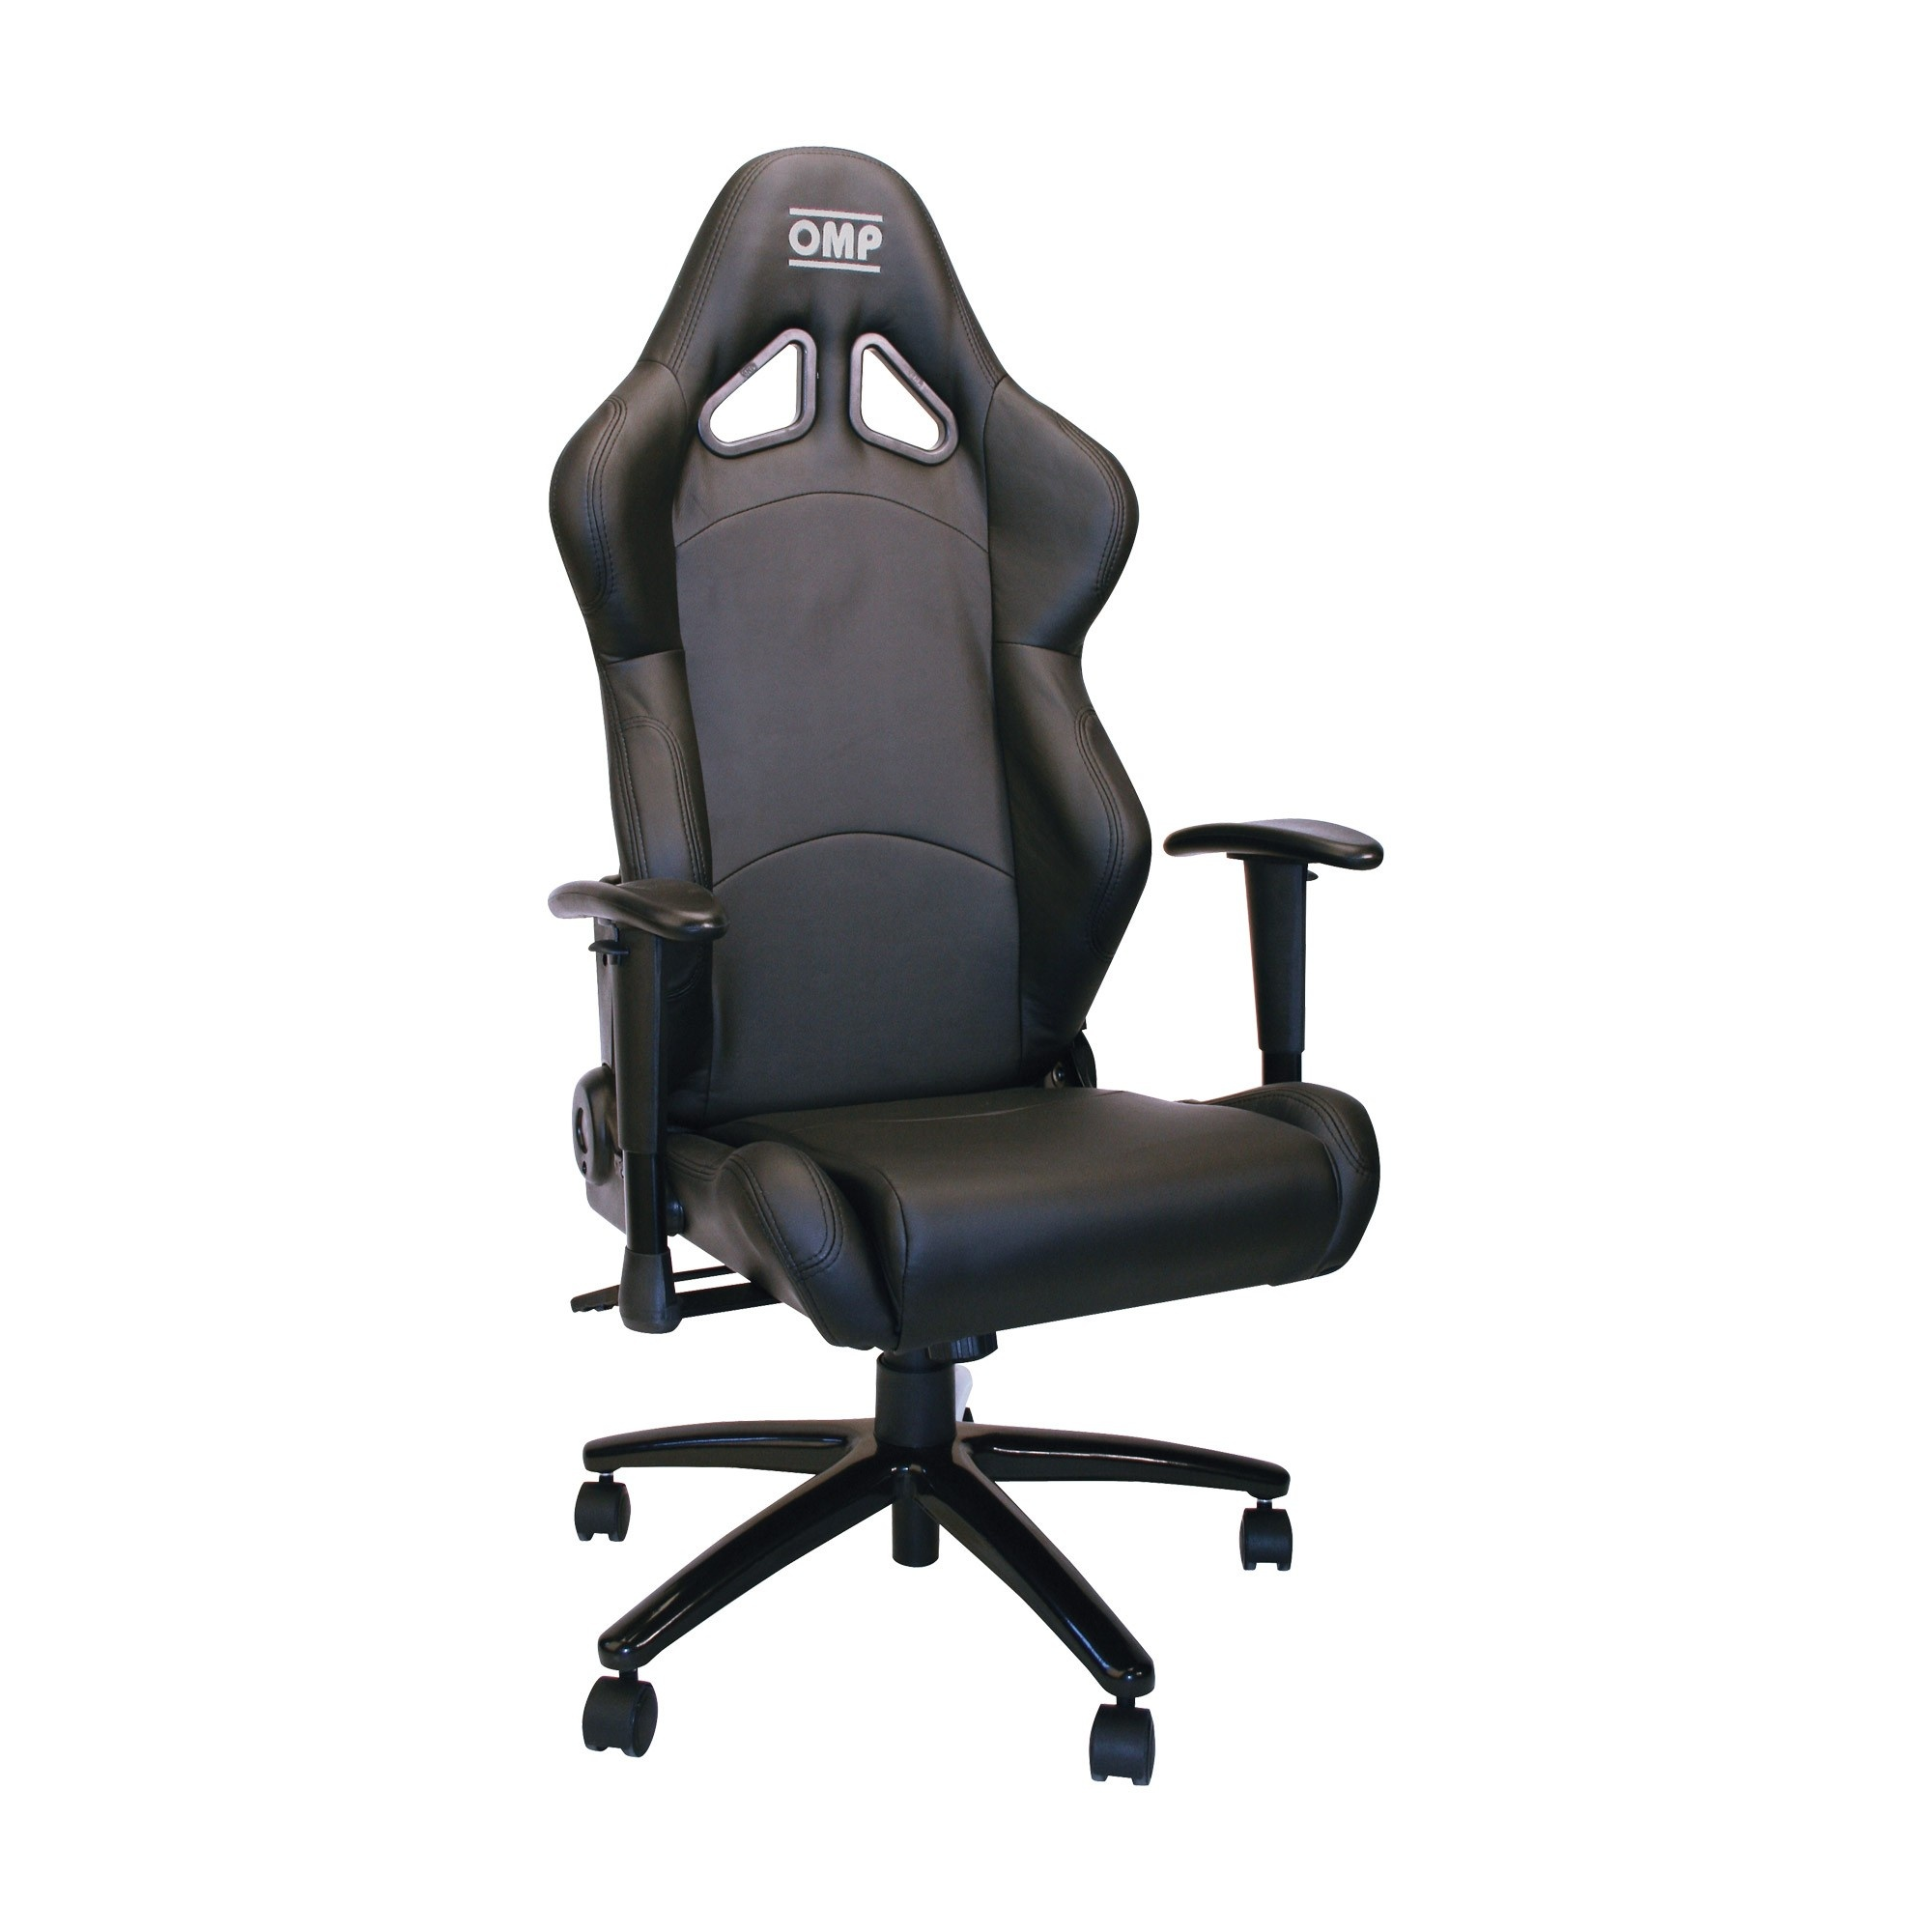 Fotel Biurowy Chair Omp Racing Czarny